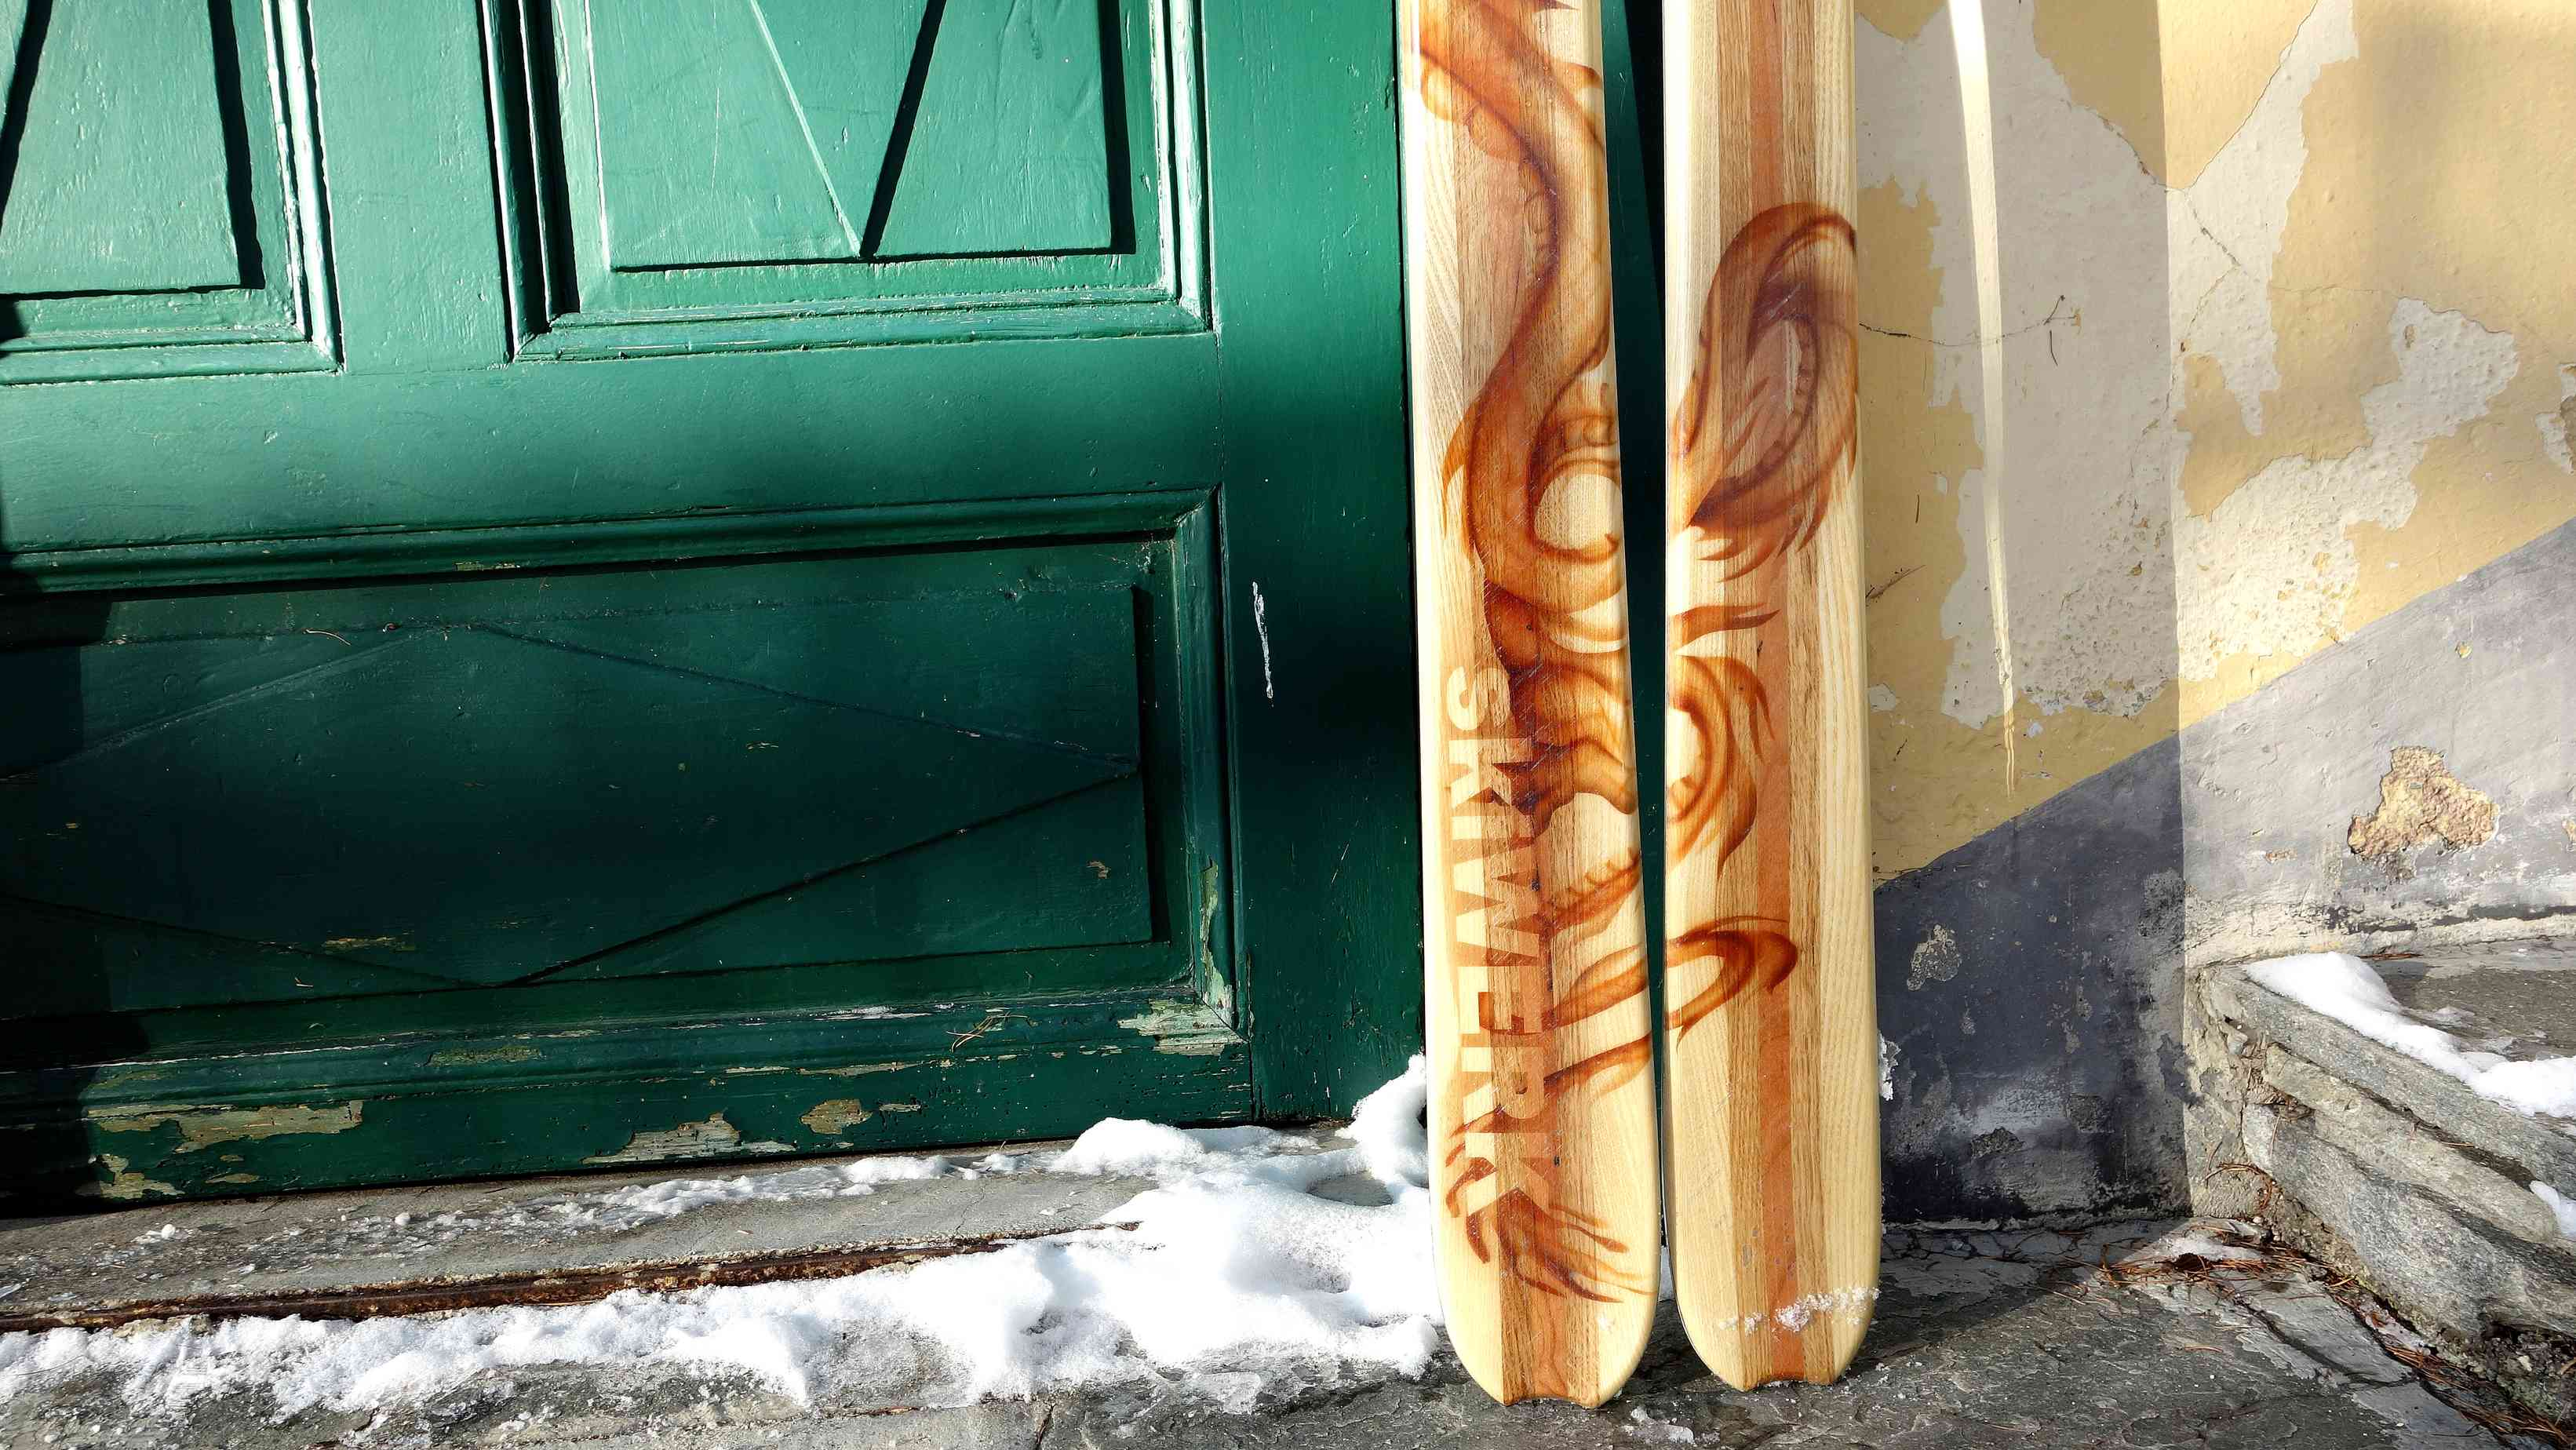 Airbrush on Ski